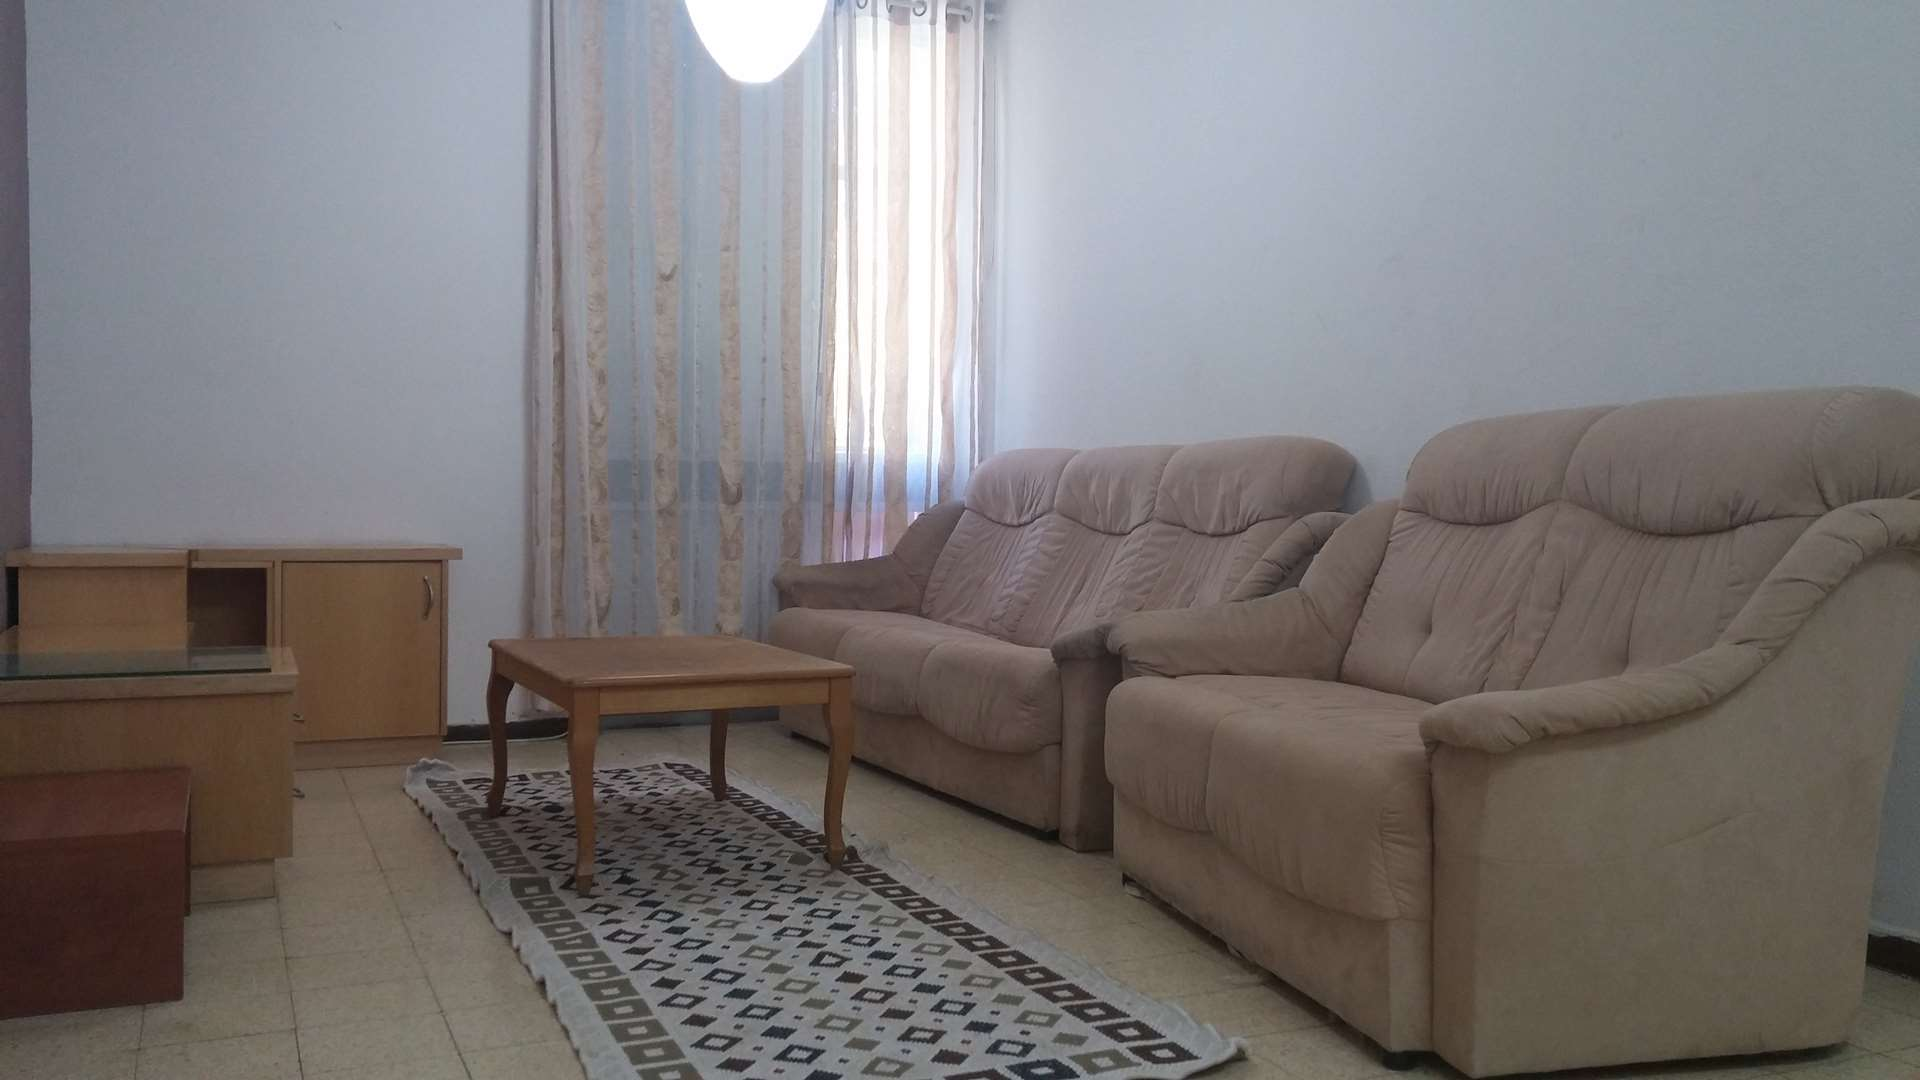 דירה, 2 חדרים, מינץב, באר שבע